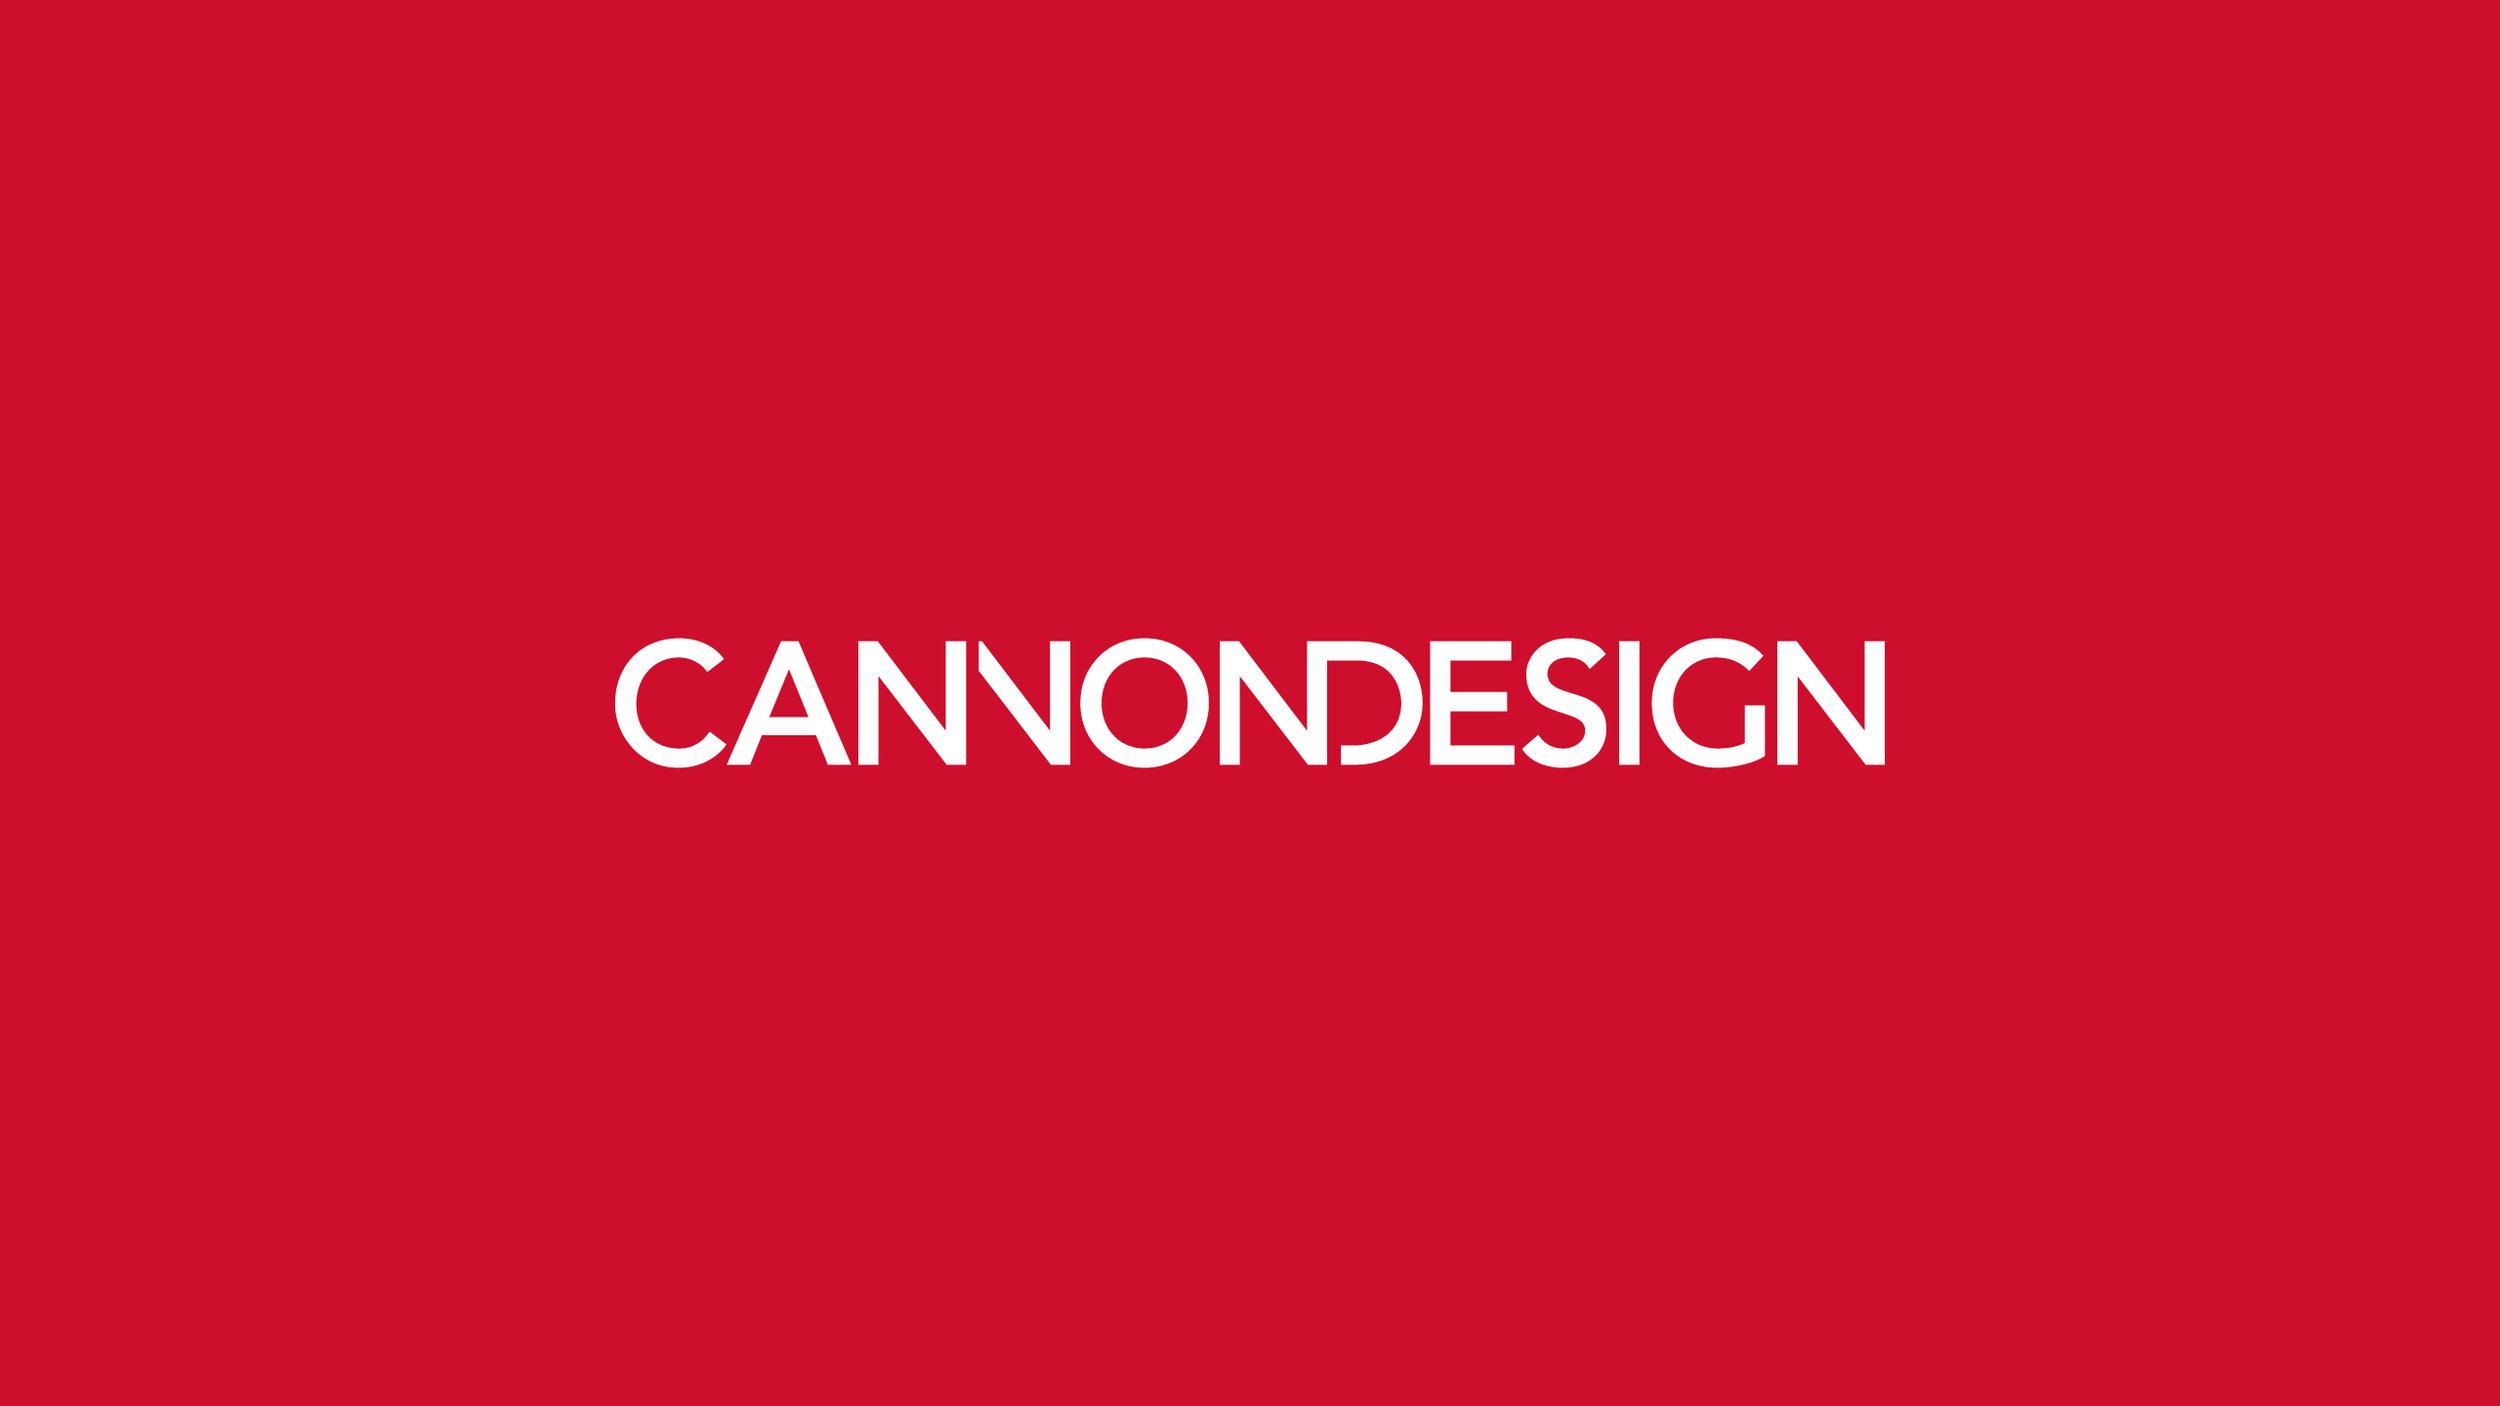 CannonDesign4.jpg